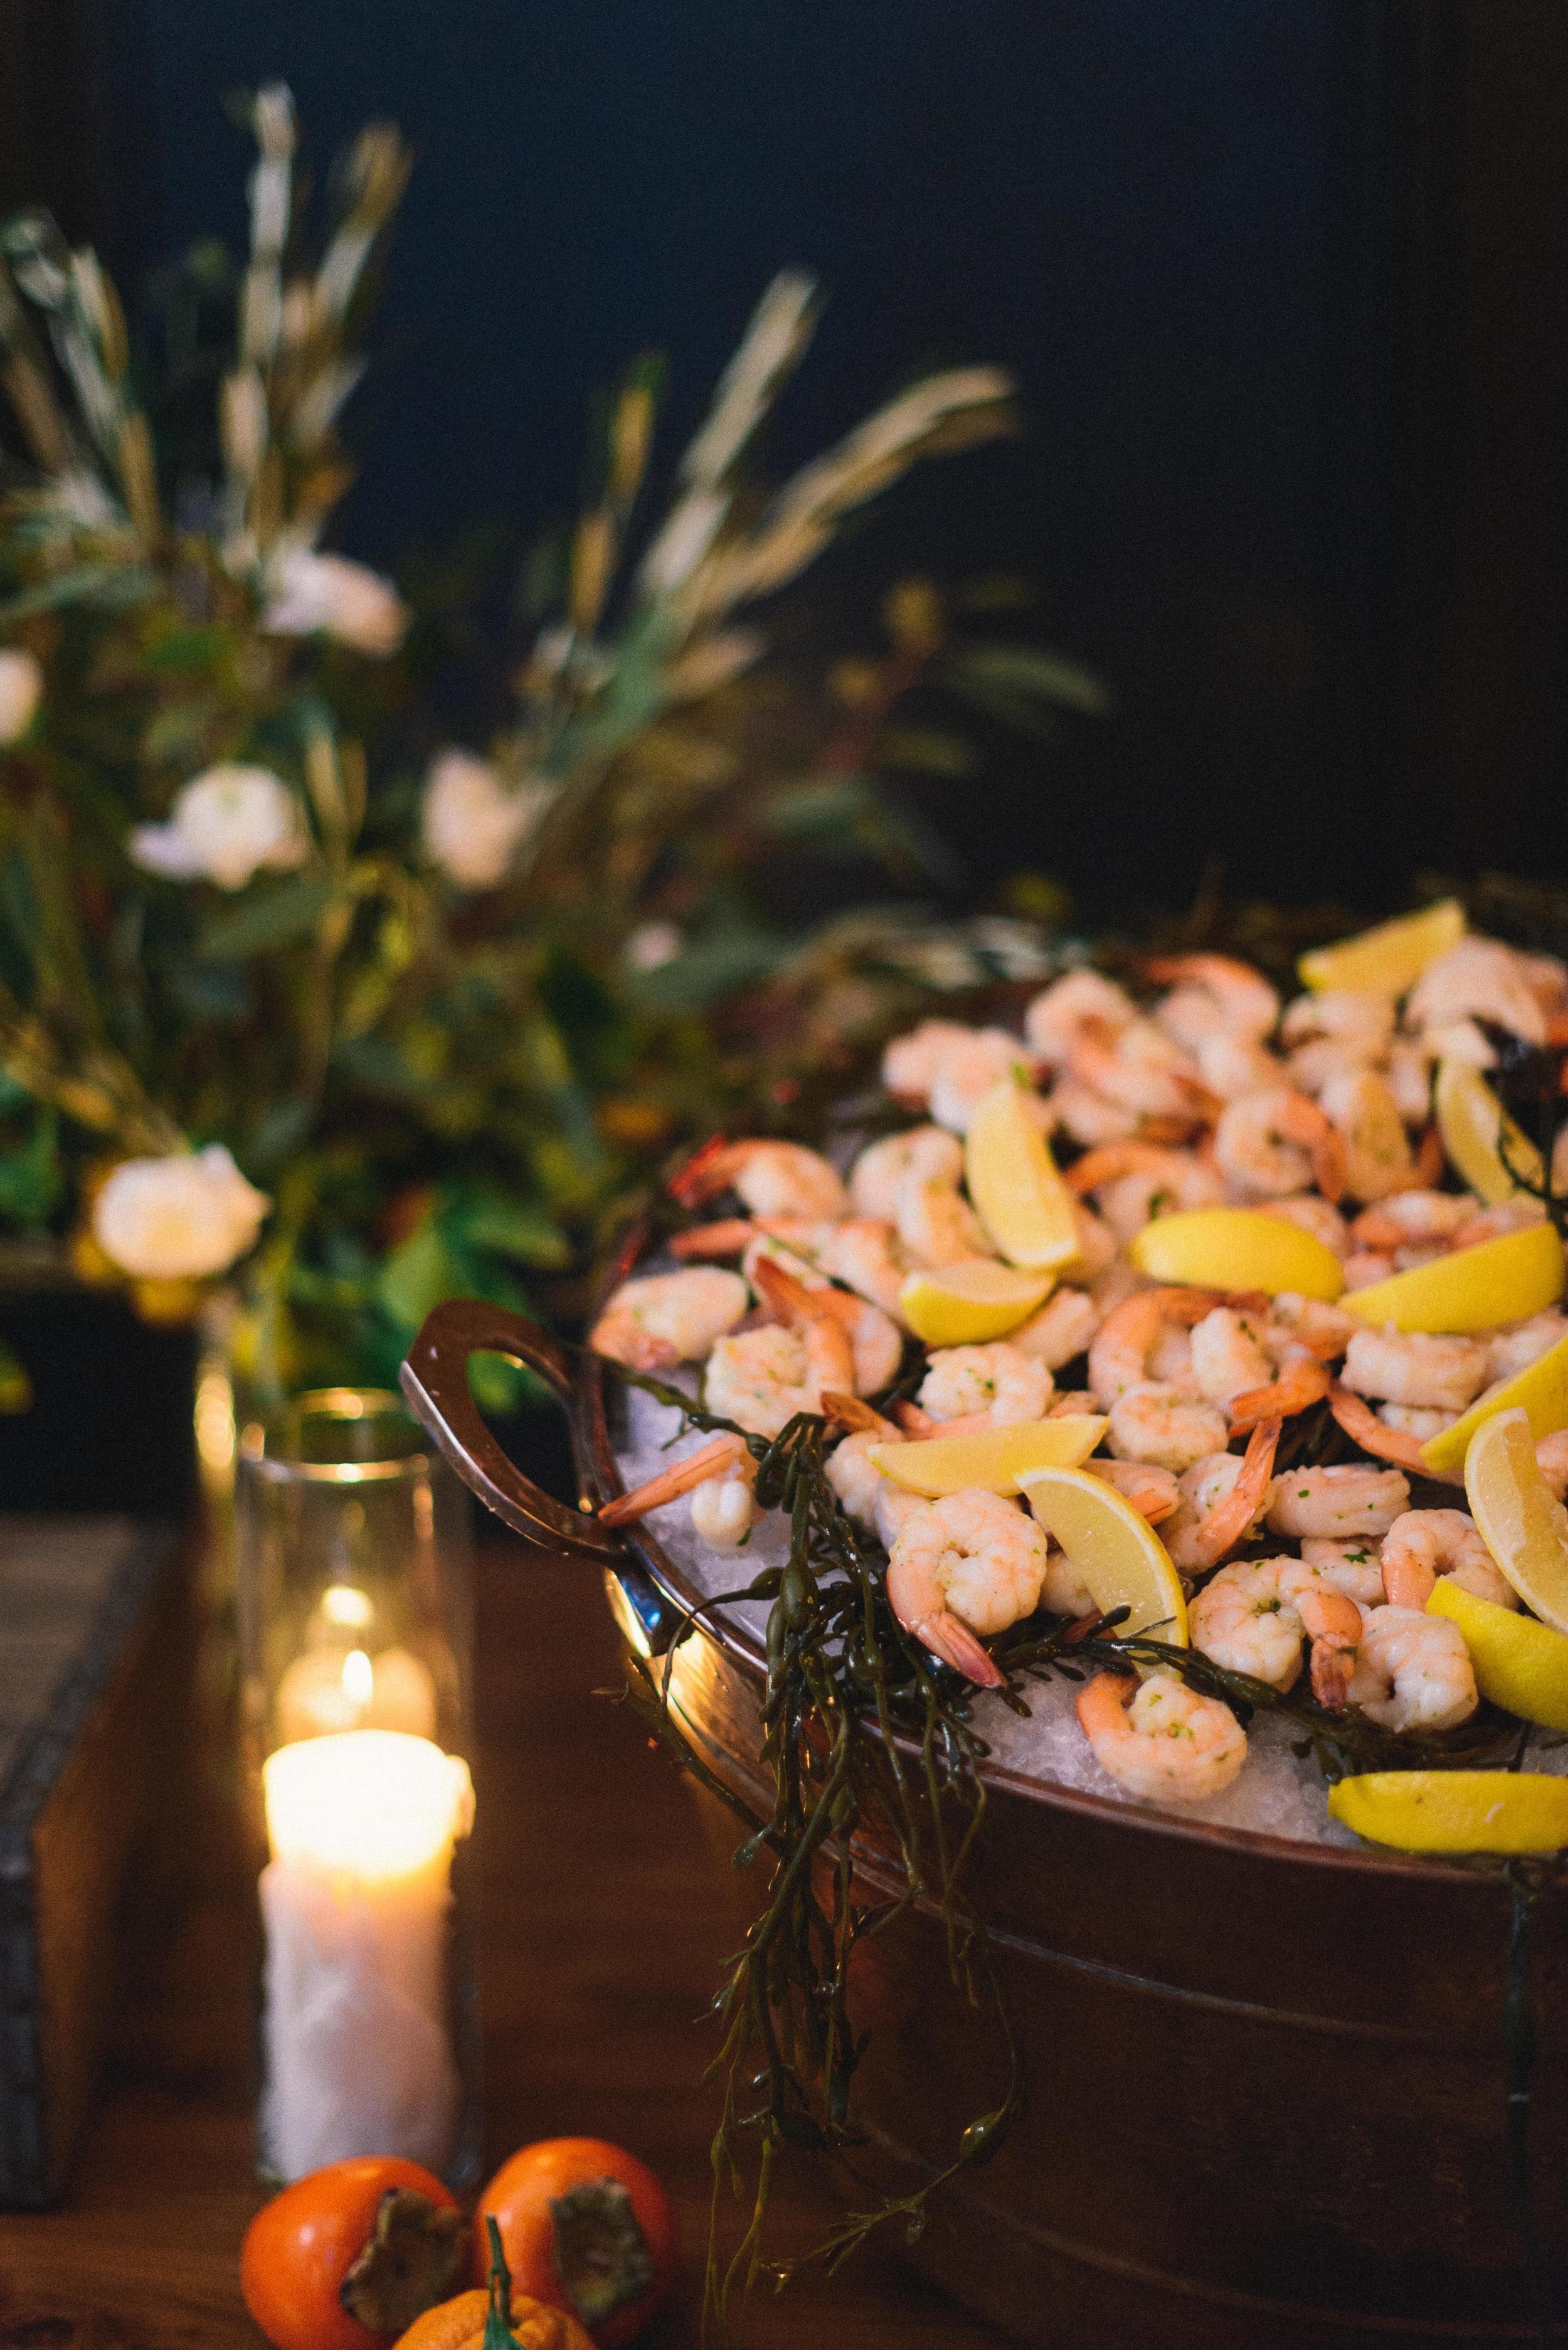 Purslane-Catering-by-Kate-Ignatowski-Photography-073.jpg